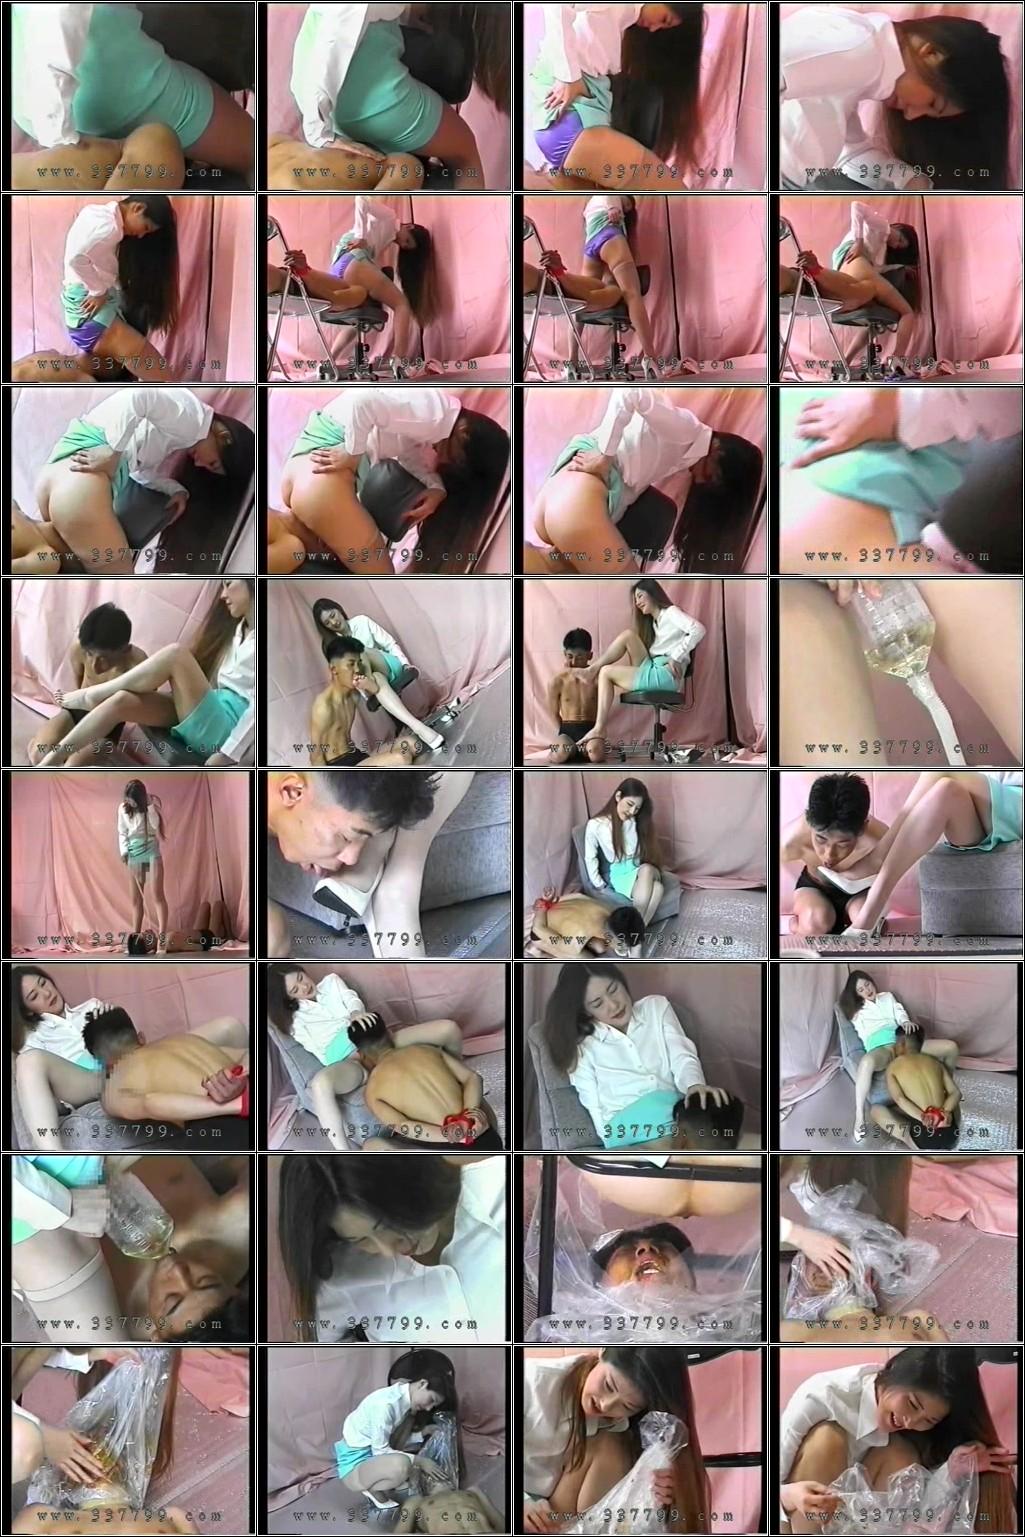 337799 Porn divx bdsm video clips - hot porno